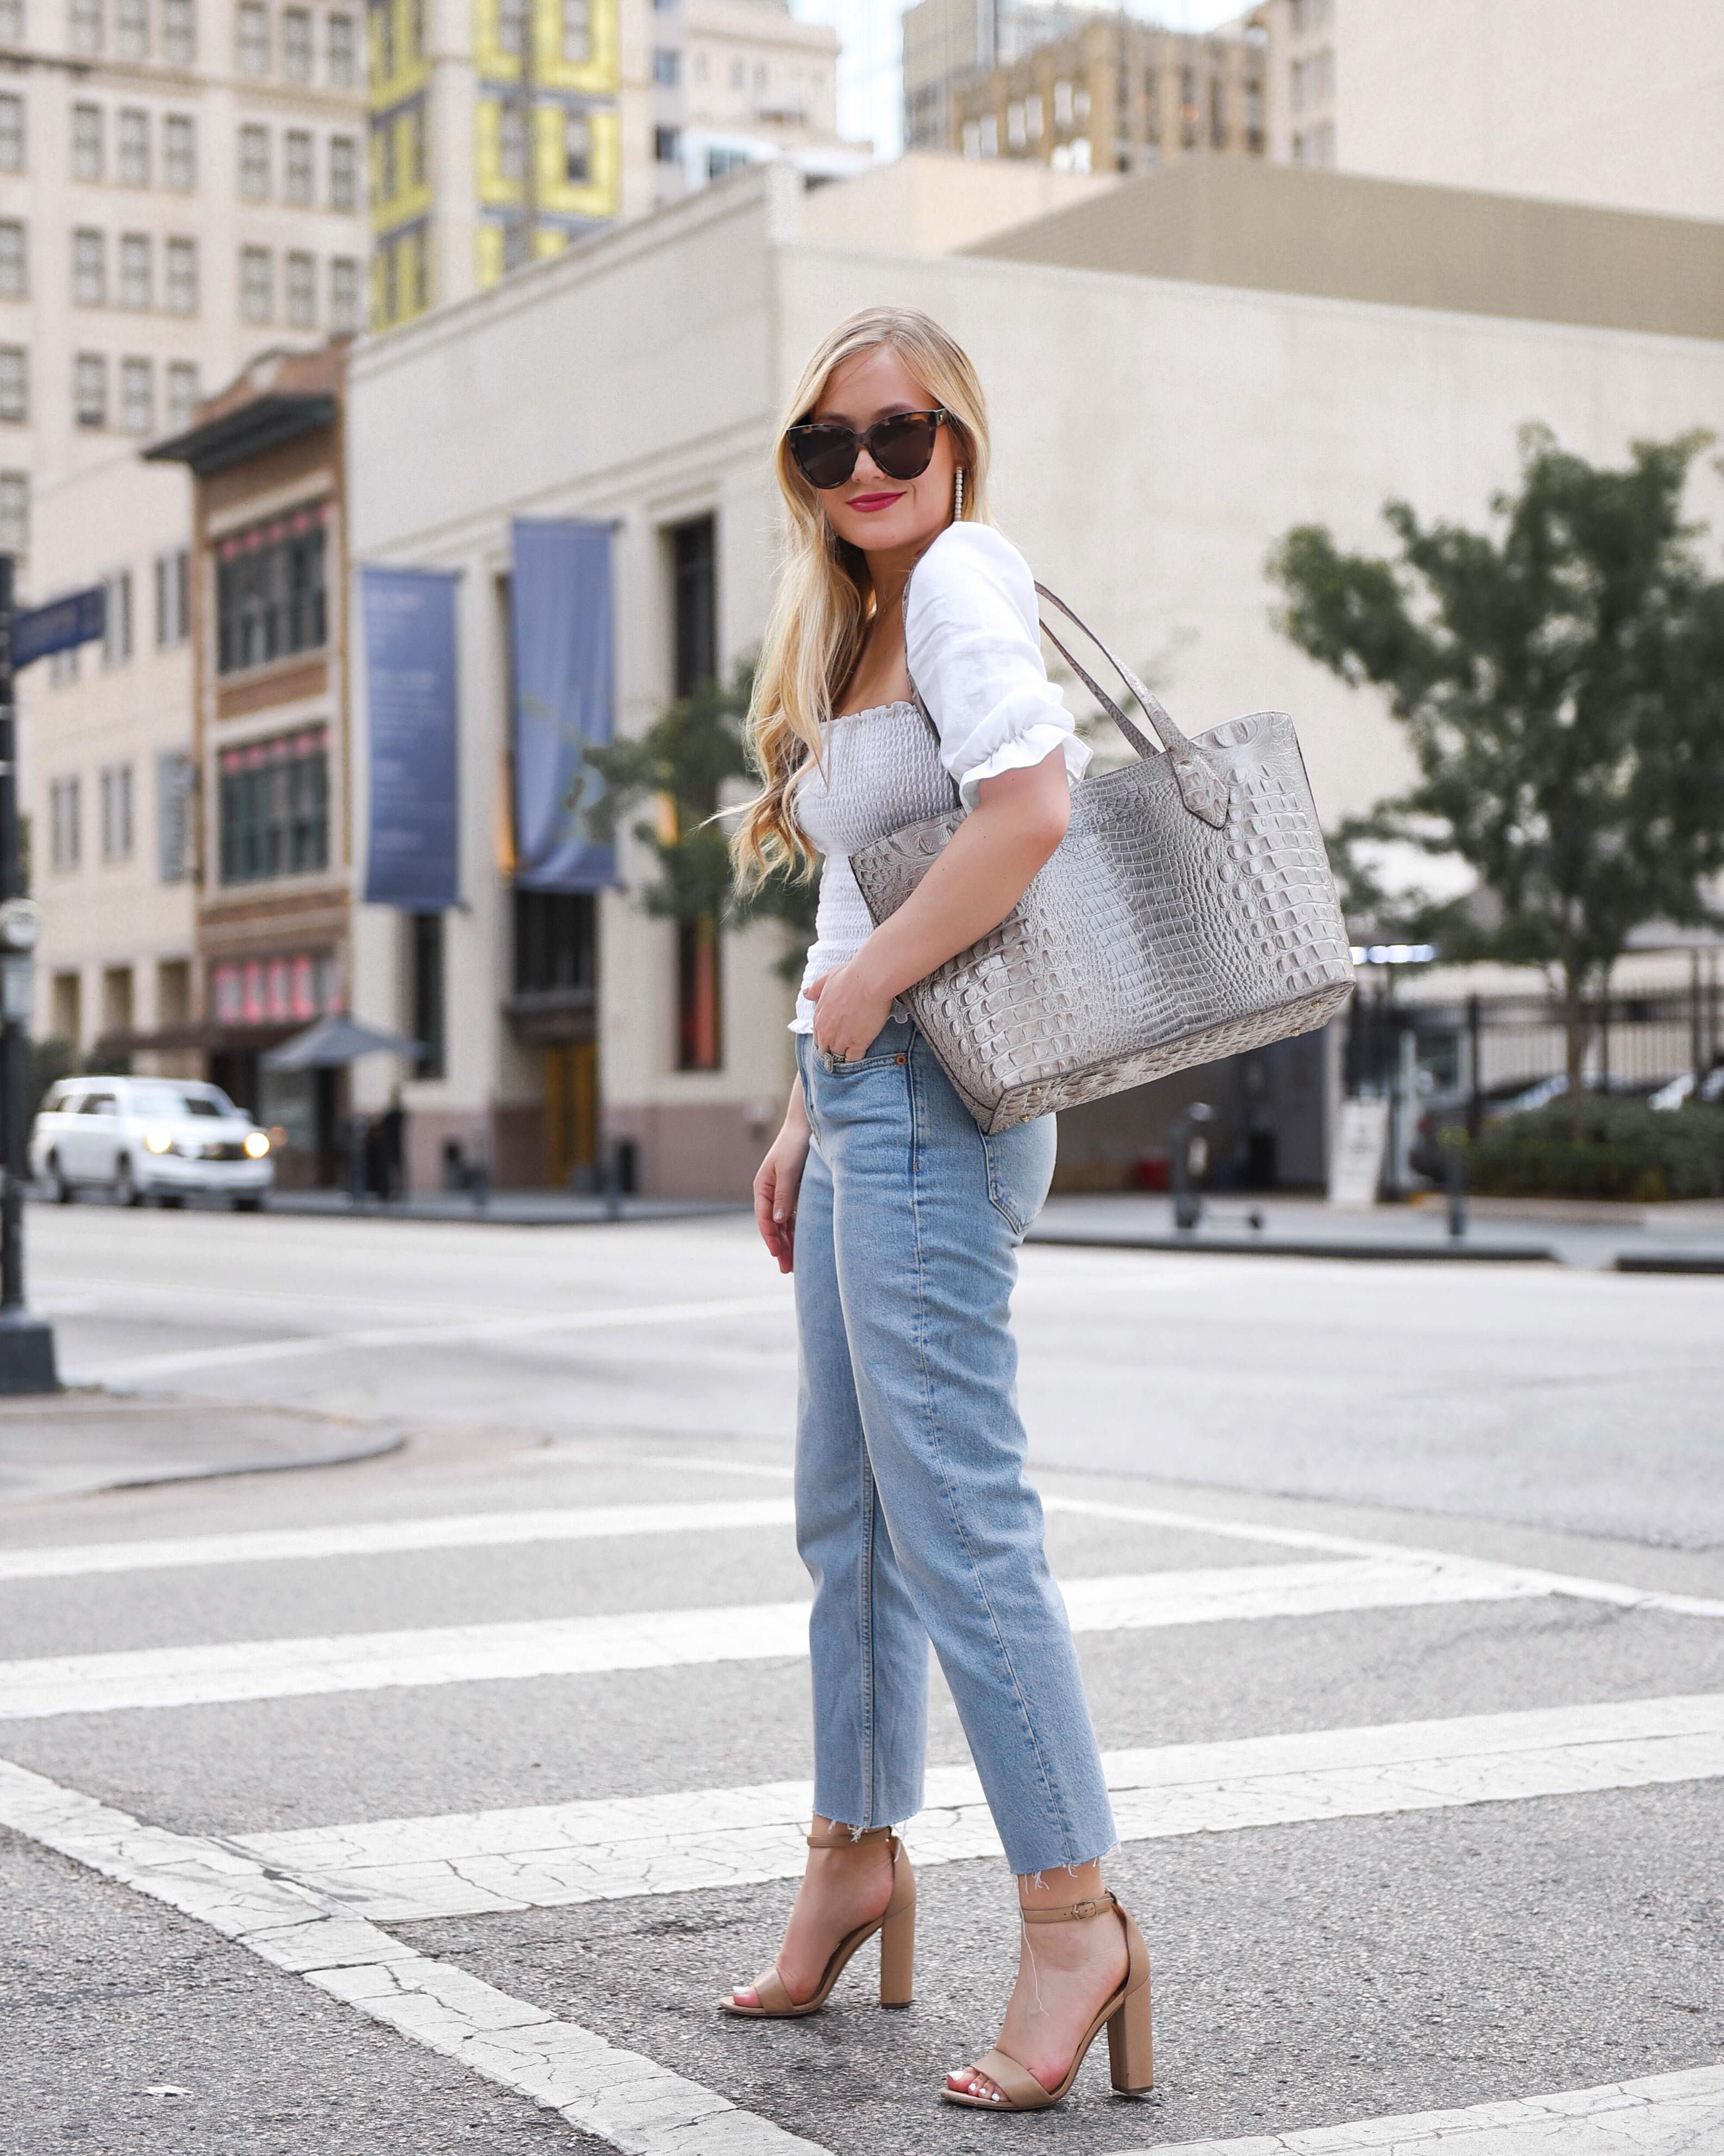 Brahmin-Tote-Bag-Dallas-Blogger-Designer-Handbag-Casual-street-style-Lo-Murphy